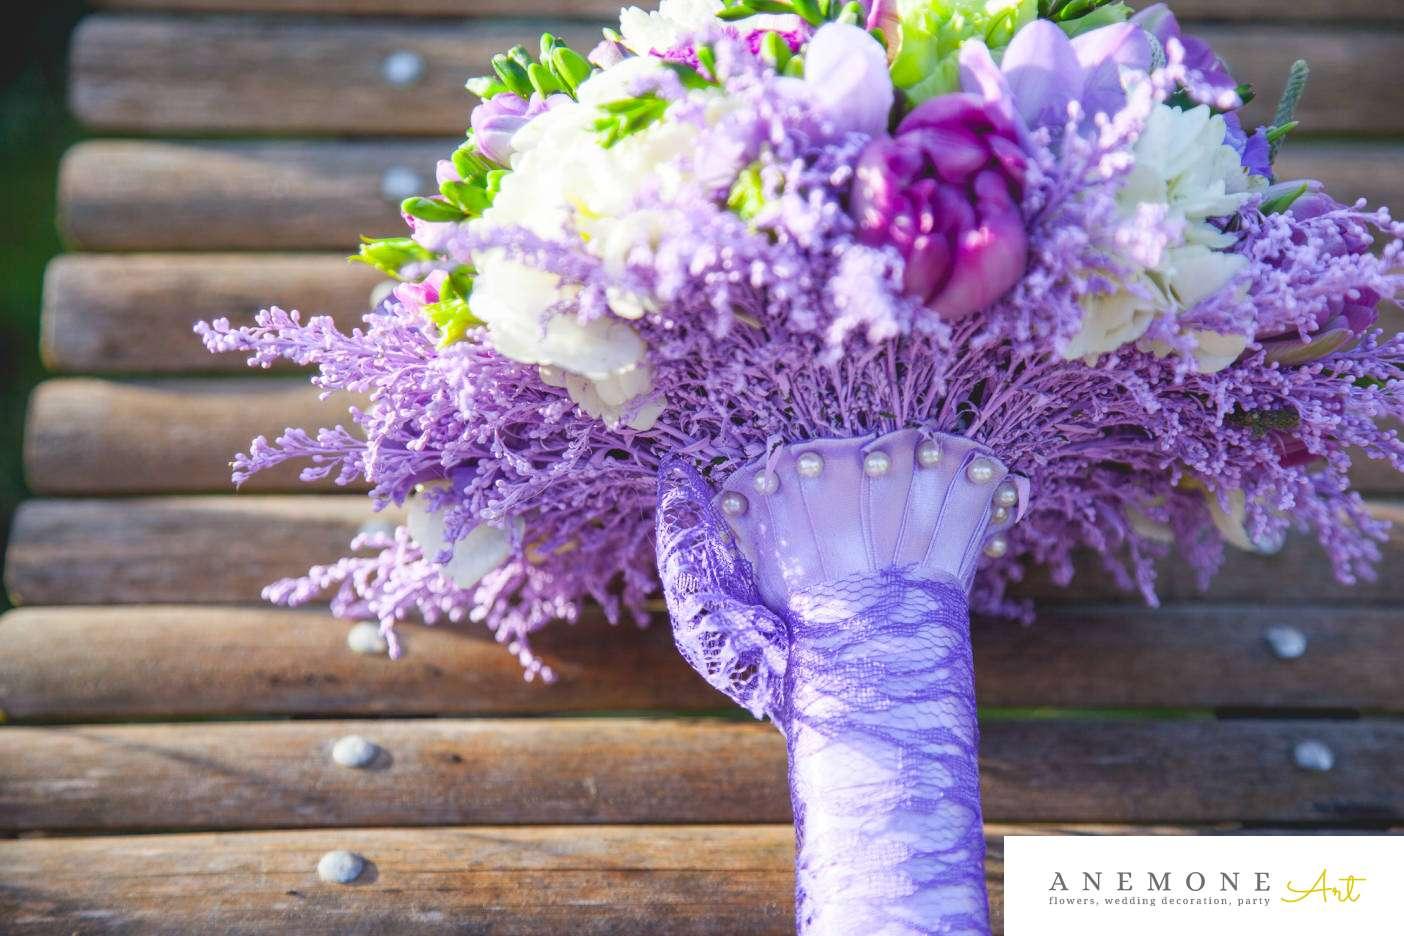 Poza, foto cu Flori de nunta buchet mireasa, frezii, lalele, maner buchet in Arad, Timisoara, Oradea (wedding flowers, bouquets) nunta Arad, Timisoara, Oradea